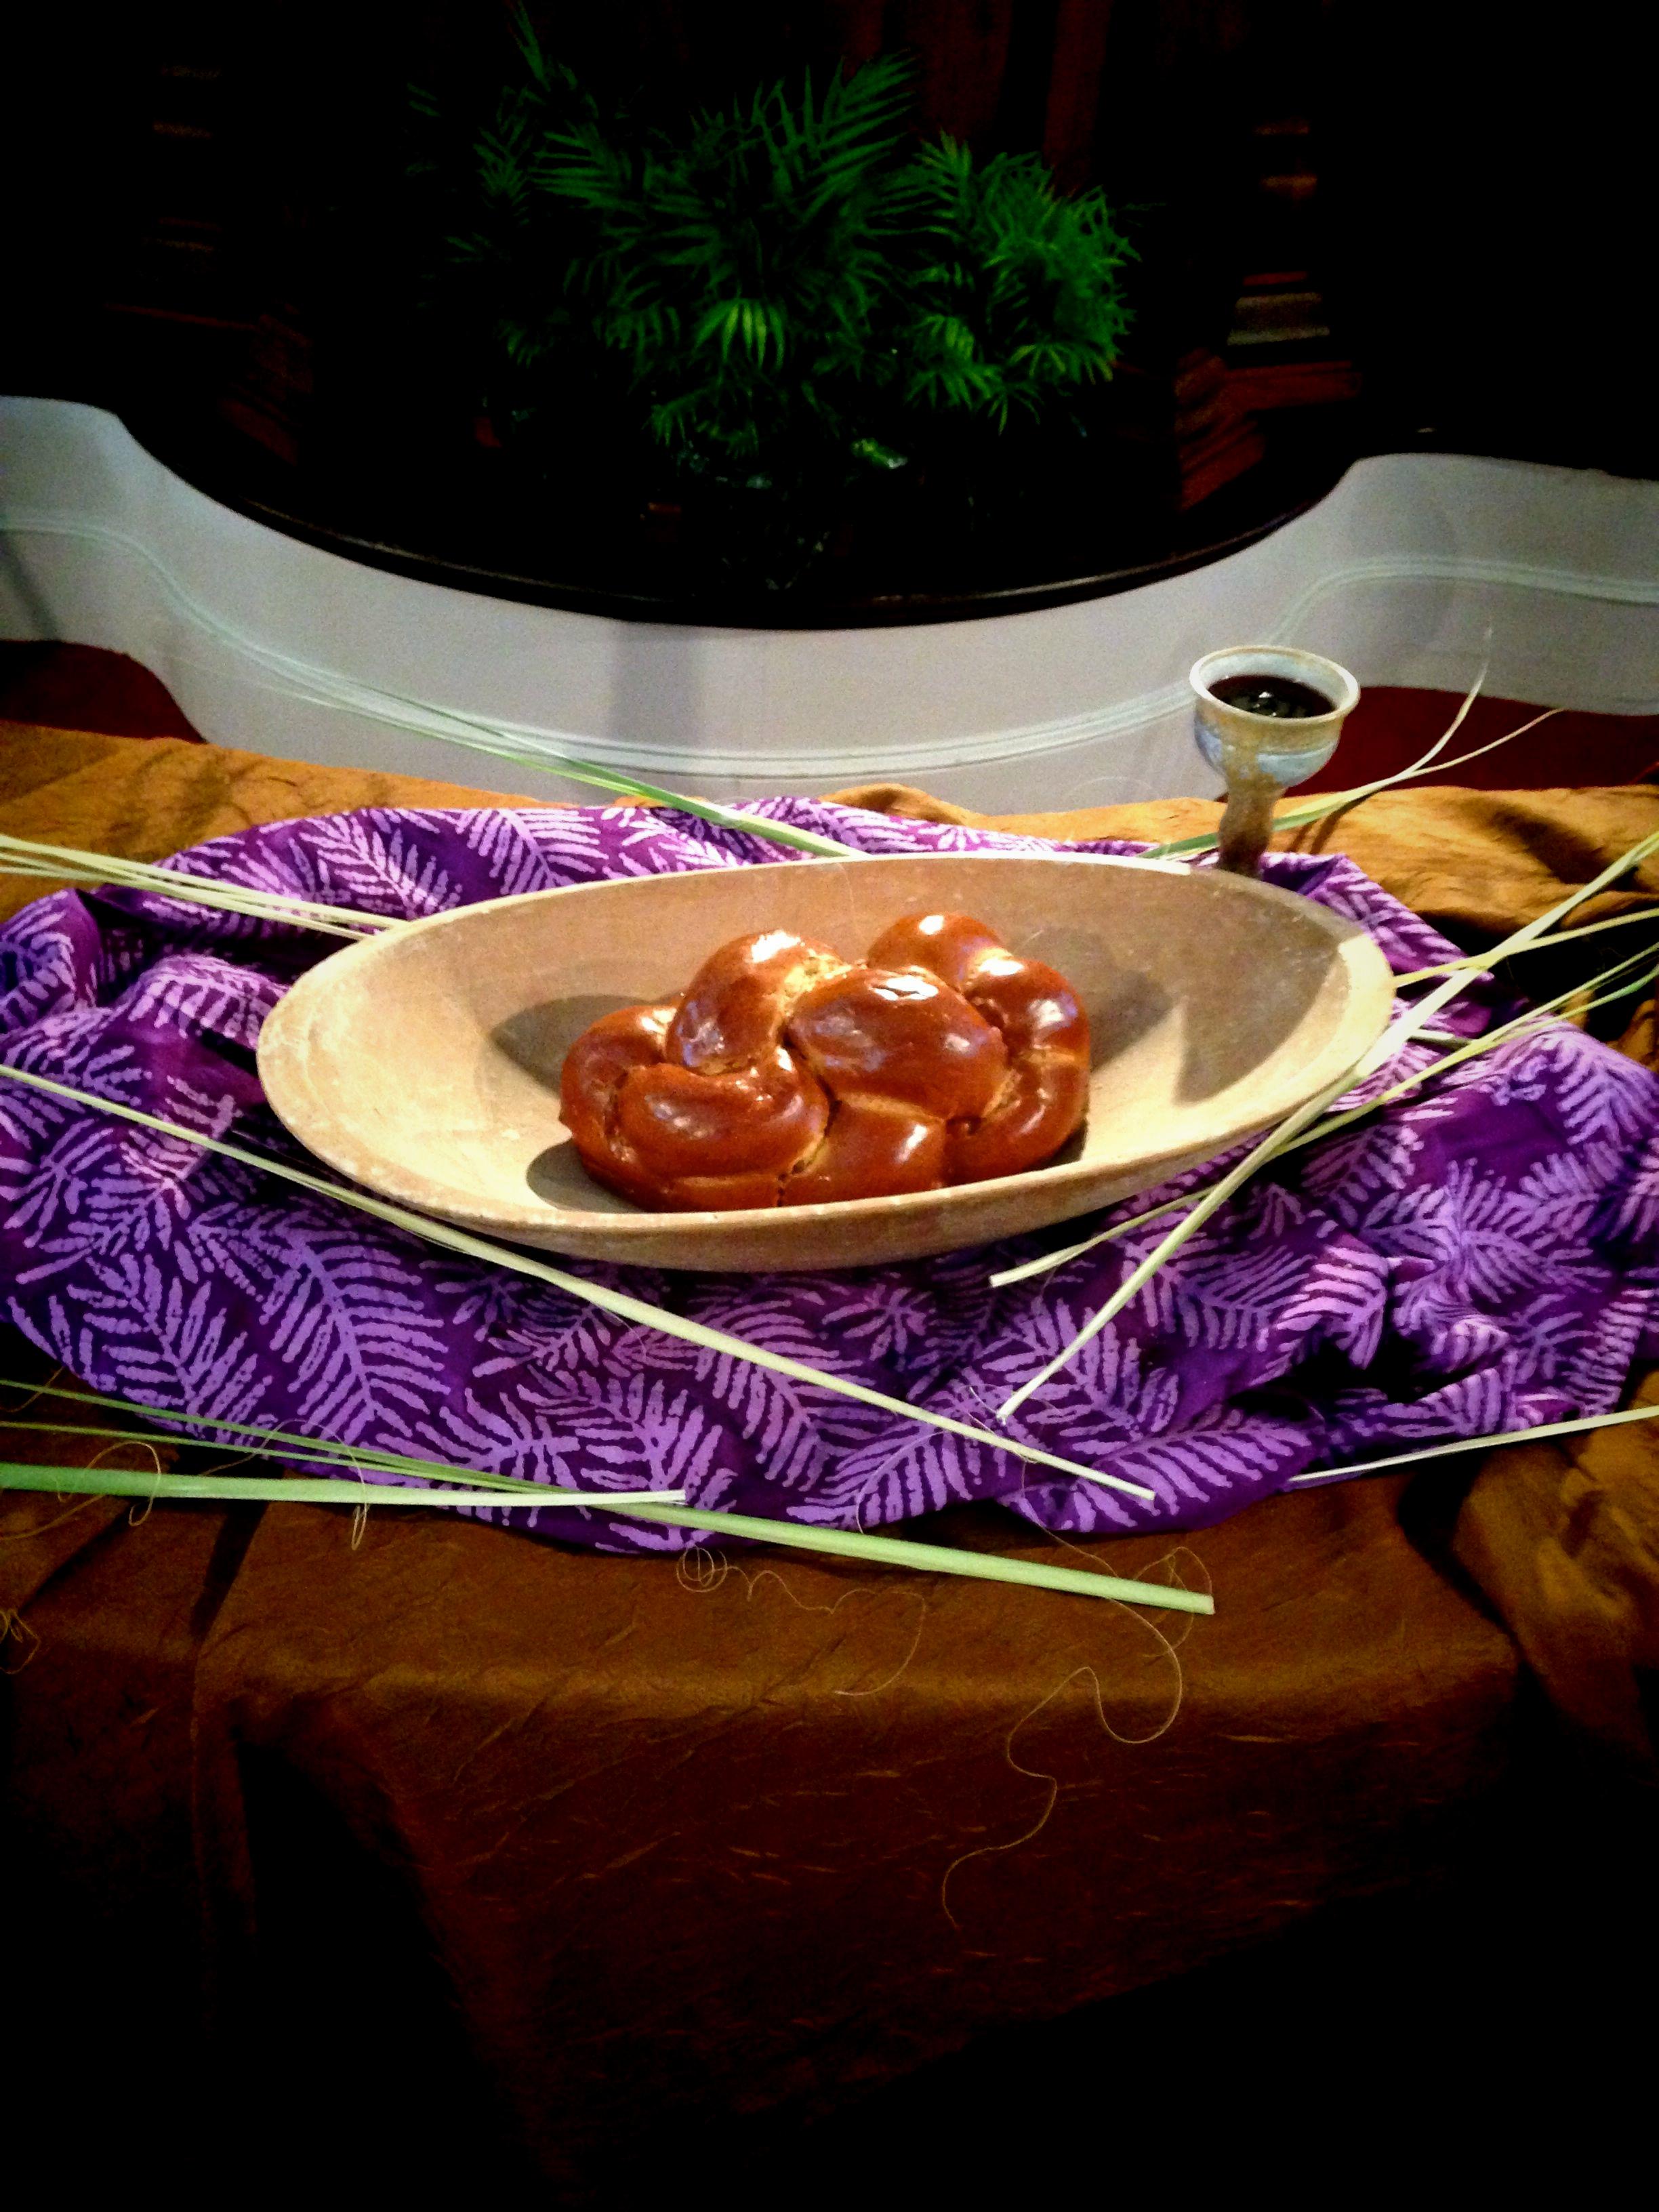 palm sunday communion